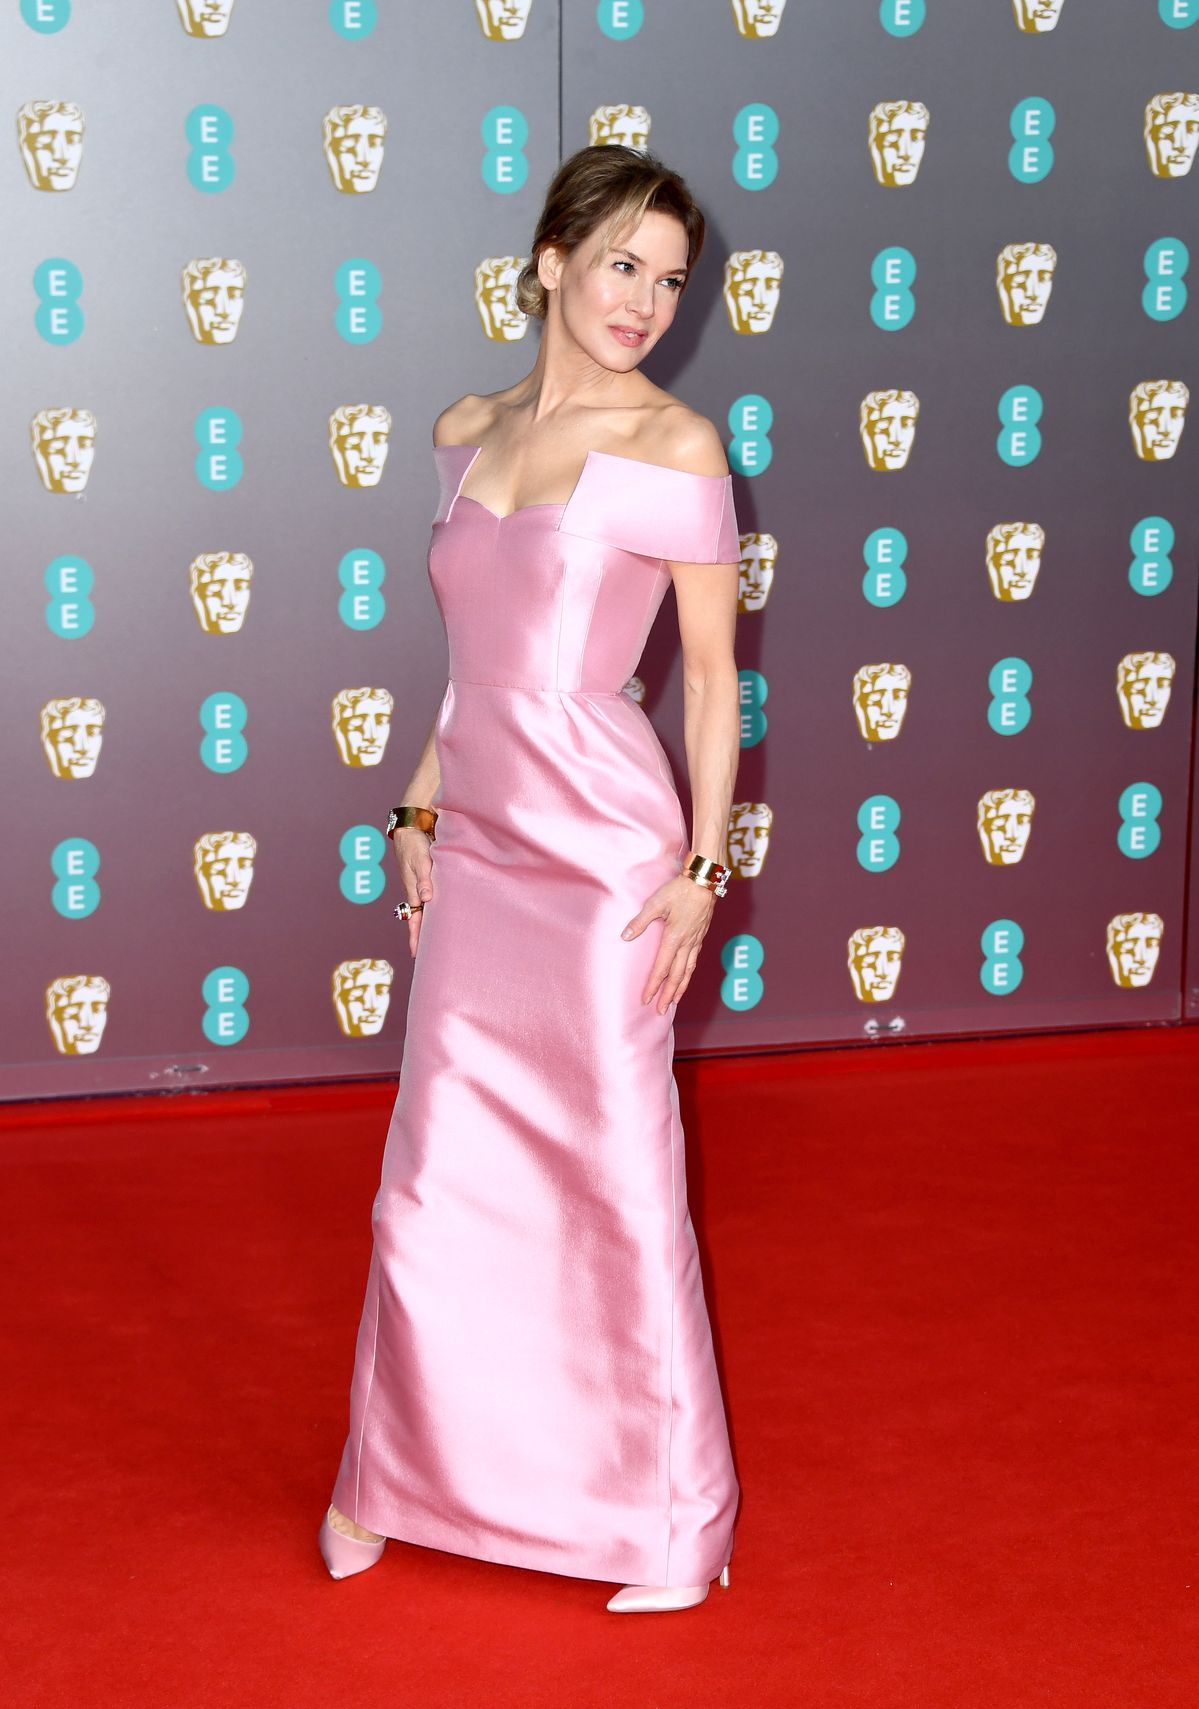 BAFTAs 2020: Hugh Grant Congratulates Renée Zellweger With 'Well Done Jones'